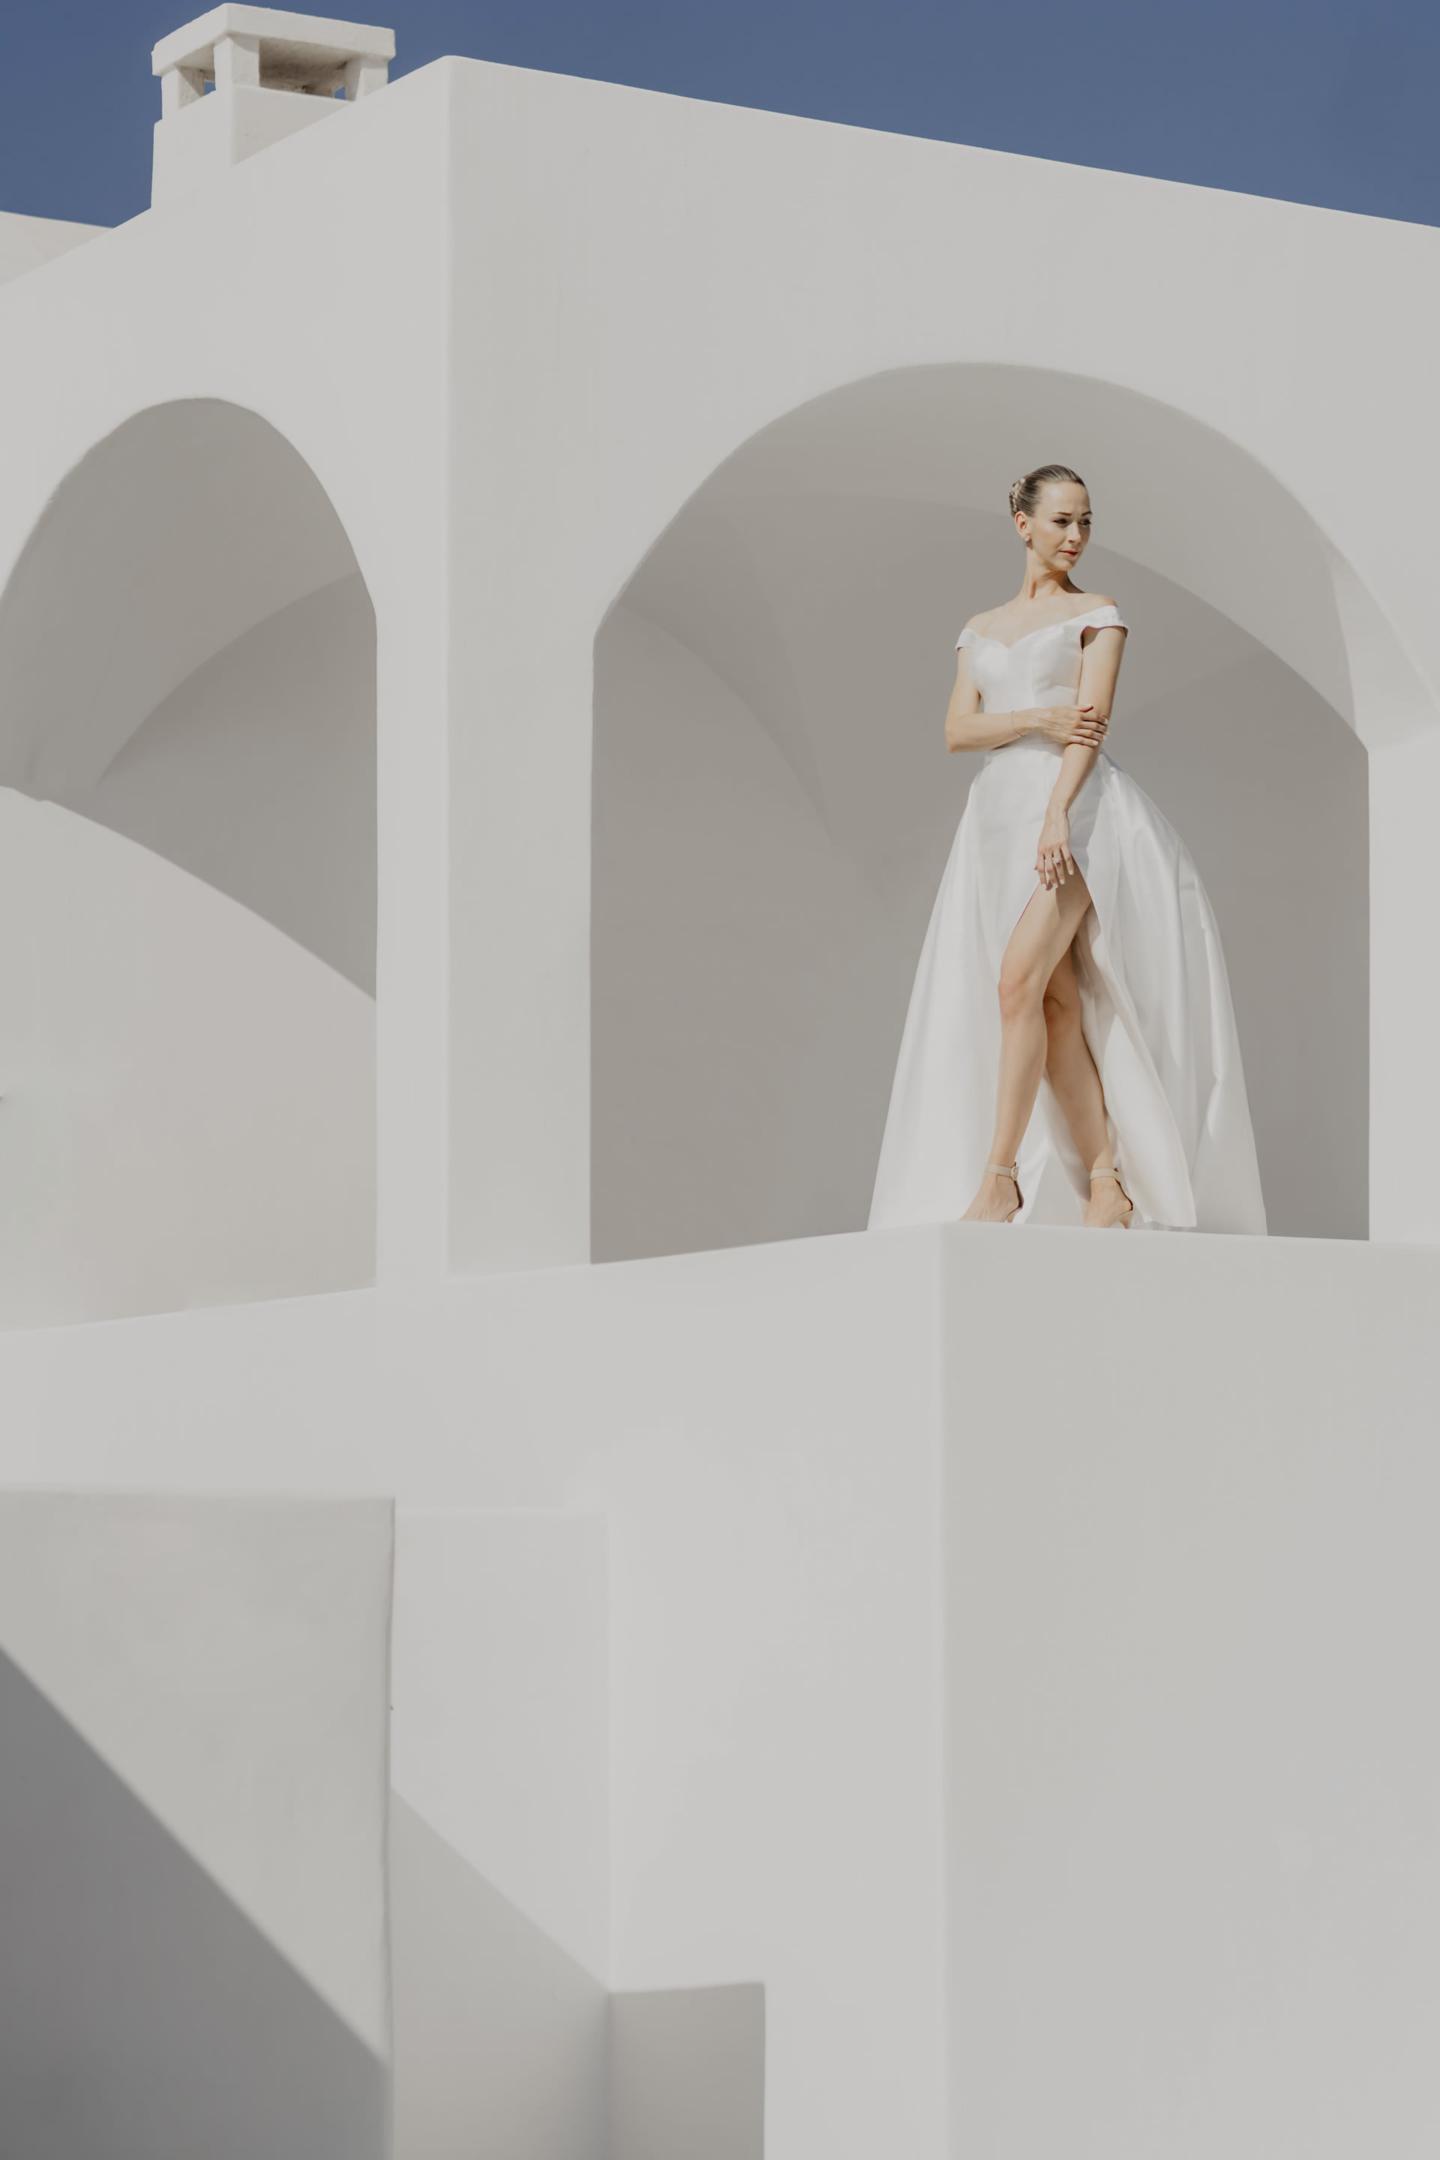 - 18 :: Santorini, a white wedding in a white island :: Luxury wedding photography - 17 ::  - 18